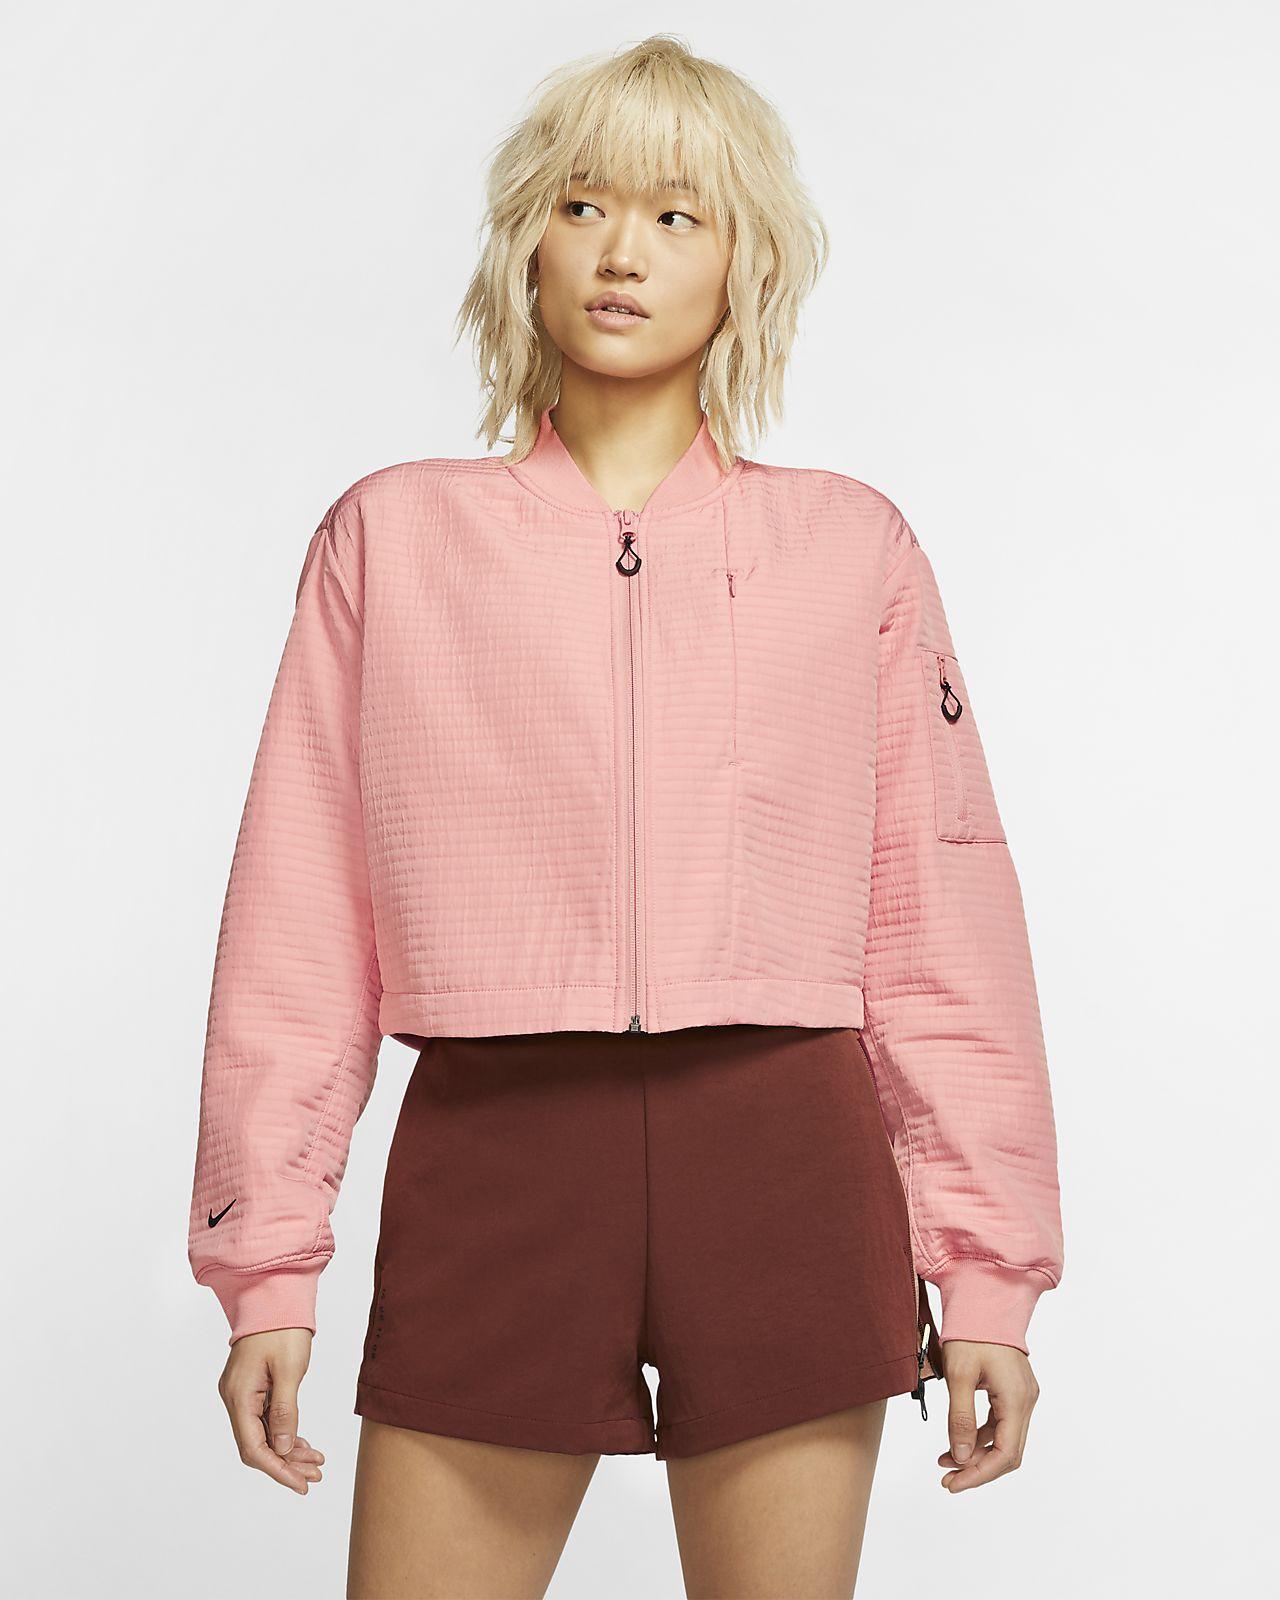 Nike Sportswear Tech Pack City Ready Chaqueta bomber - Mujer